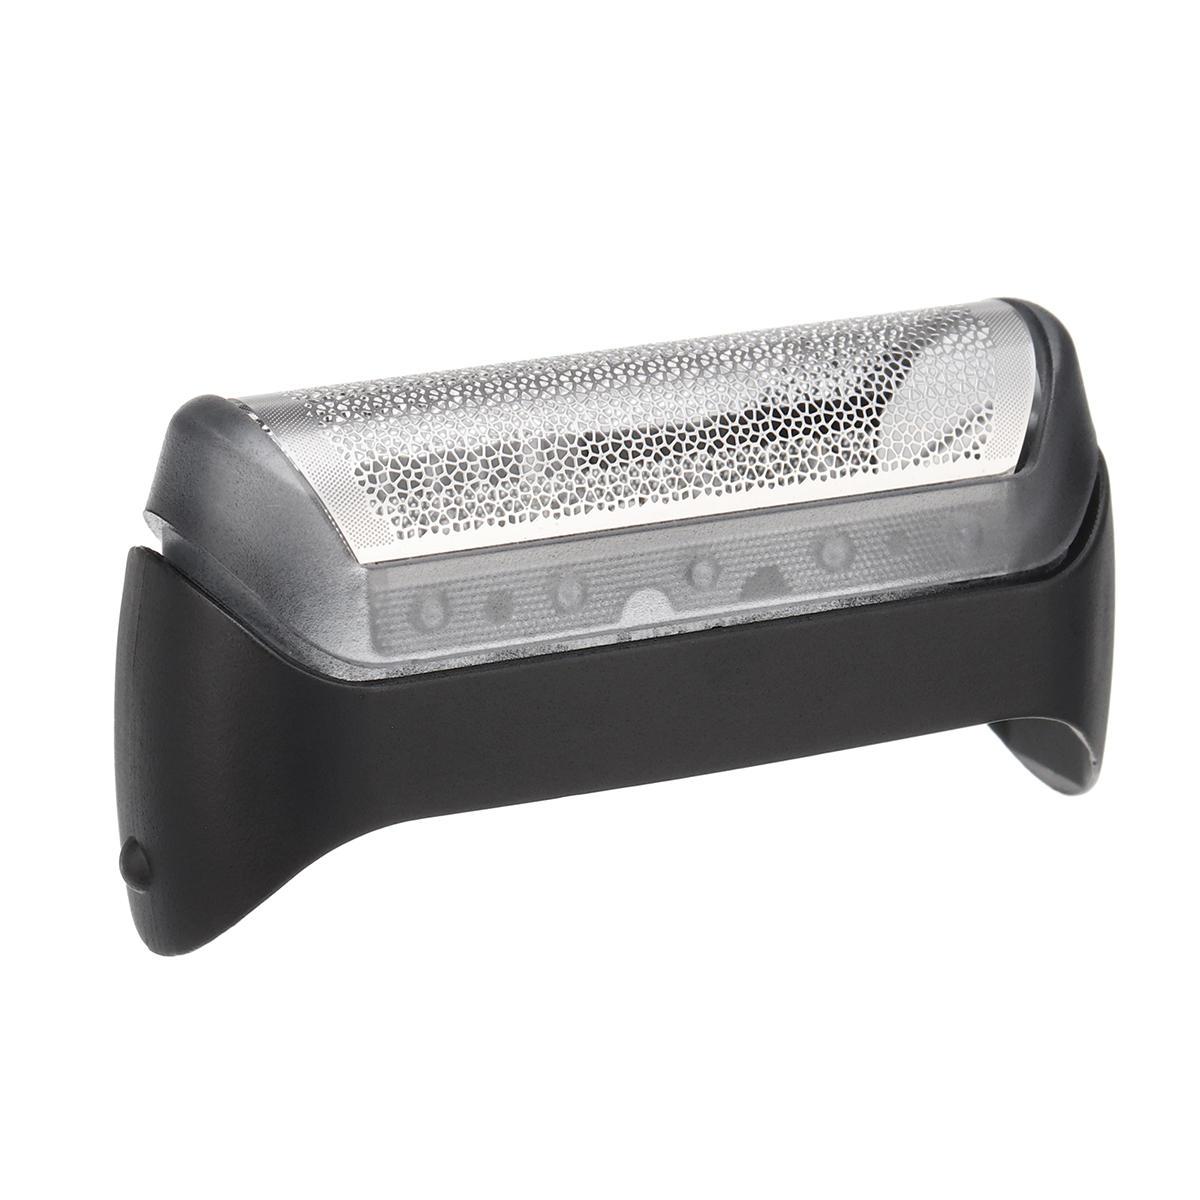 10B Shaver Foil Replacement For Braun FreeControl 1735 1775 170 180 Series 1 170 180 190 Shaver Screen Foil Razor Mesh Grid braun 10b